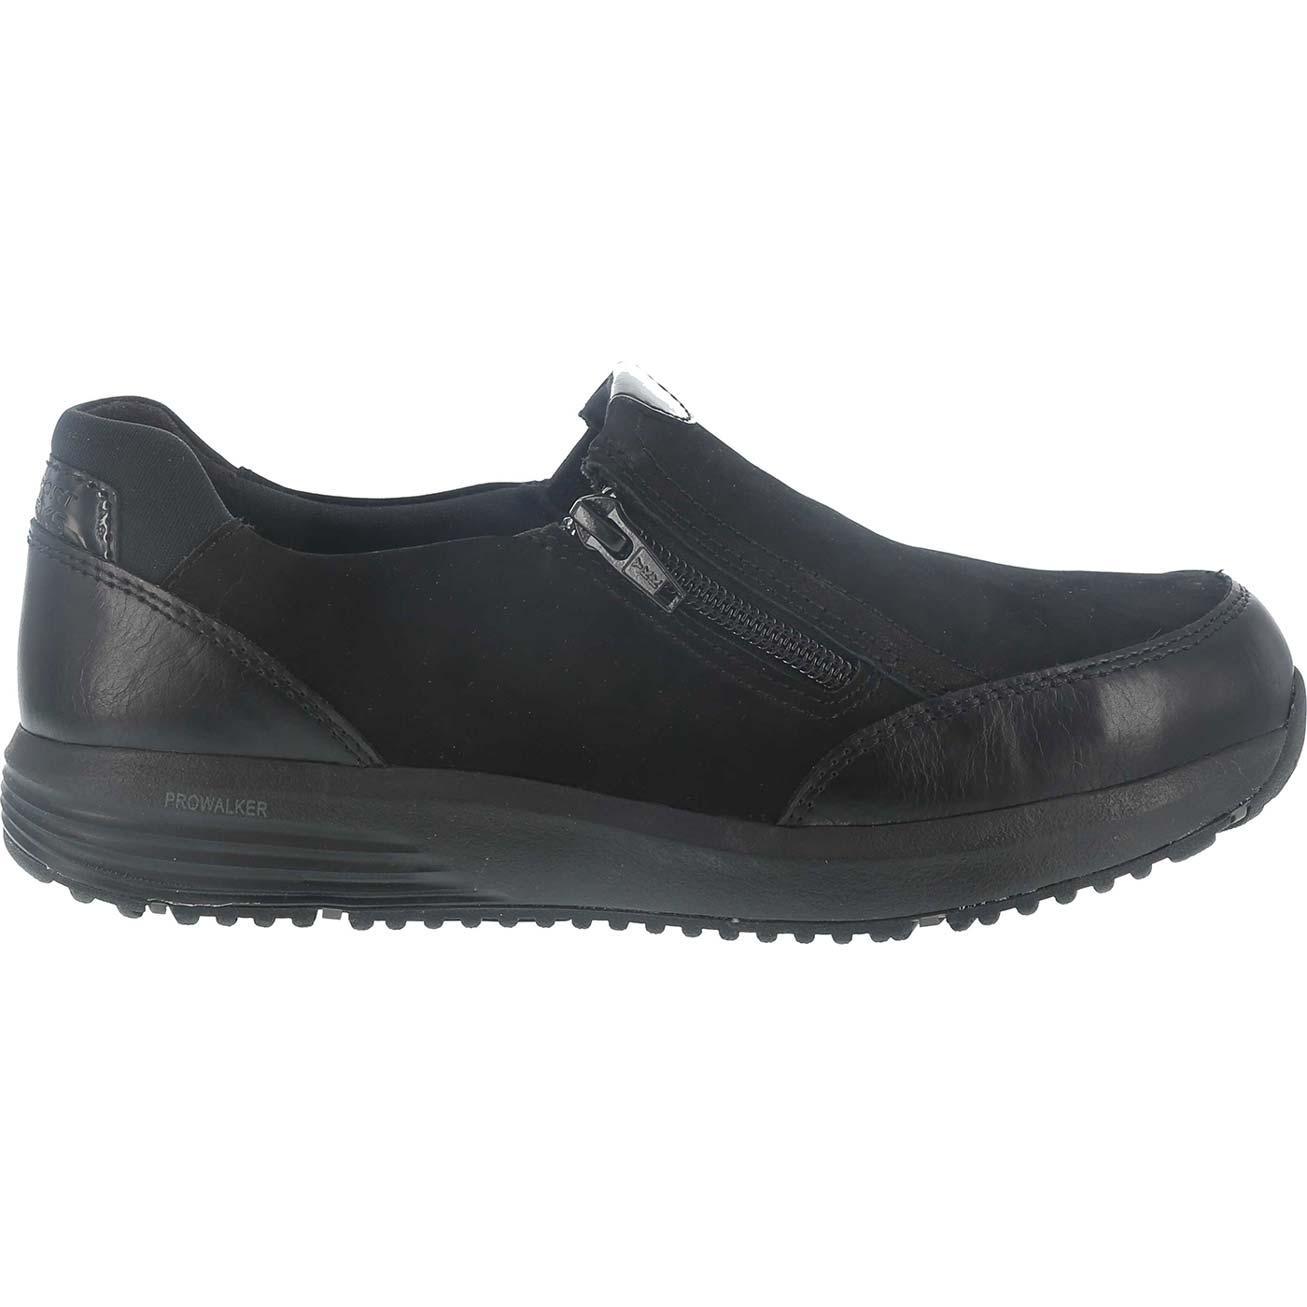 Rockport Work Women S Trustride Rk Work Shoe